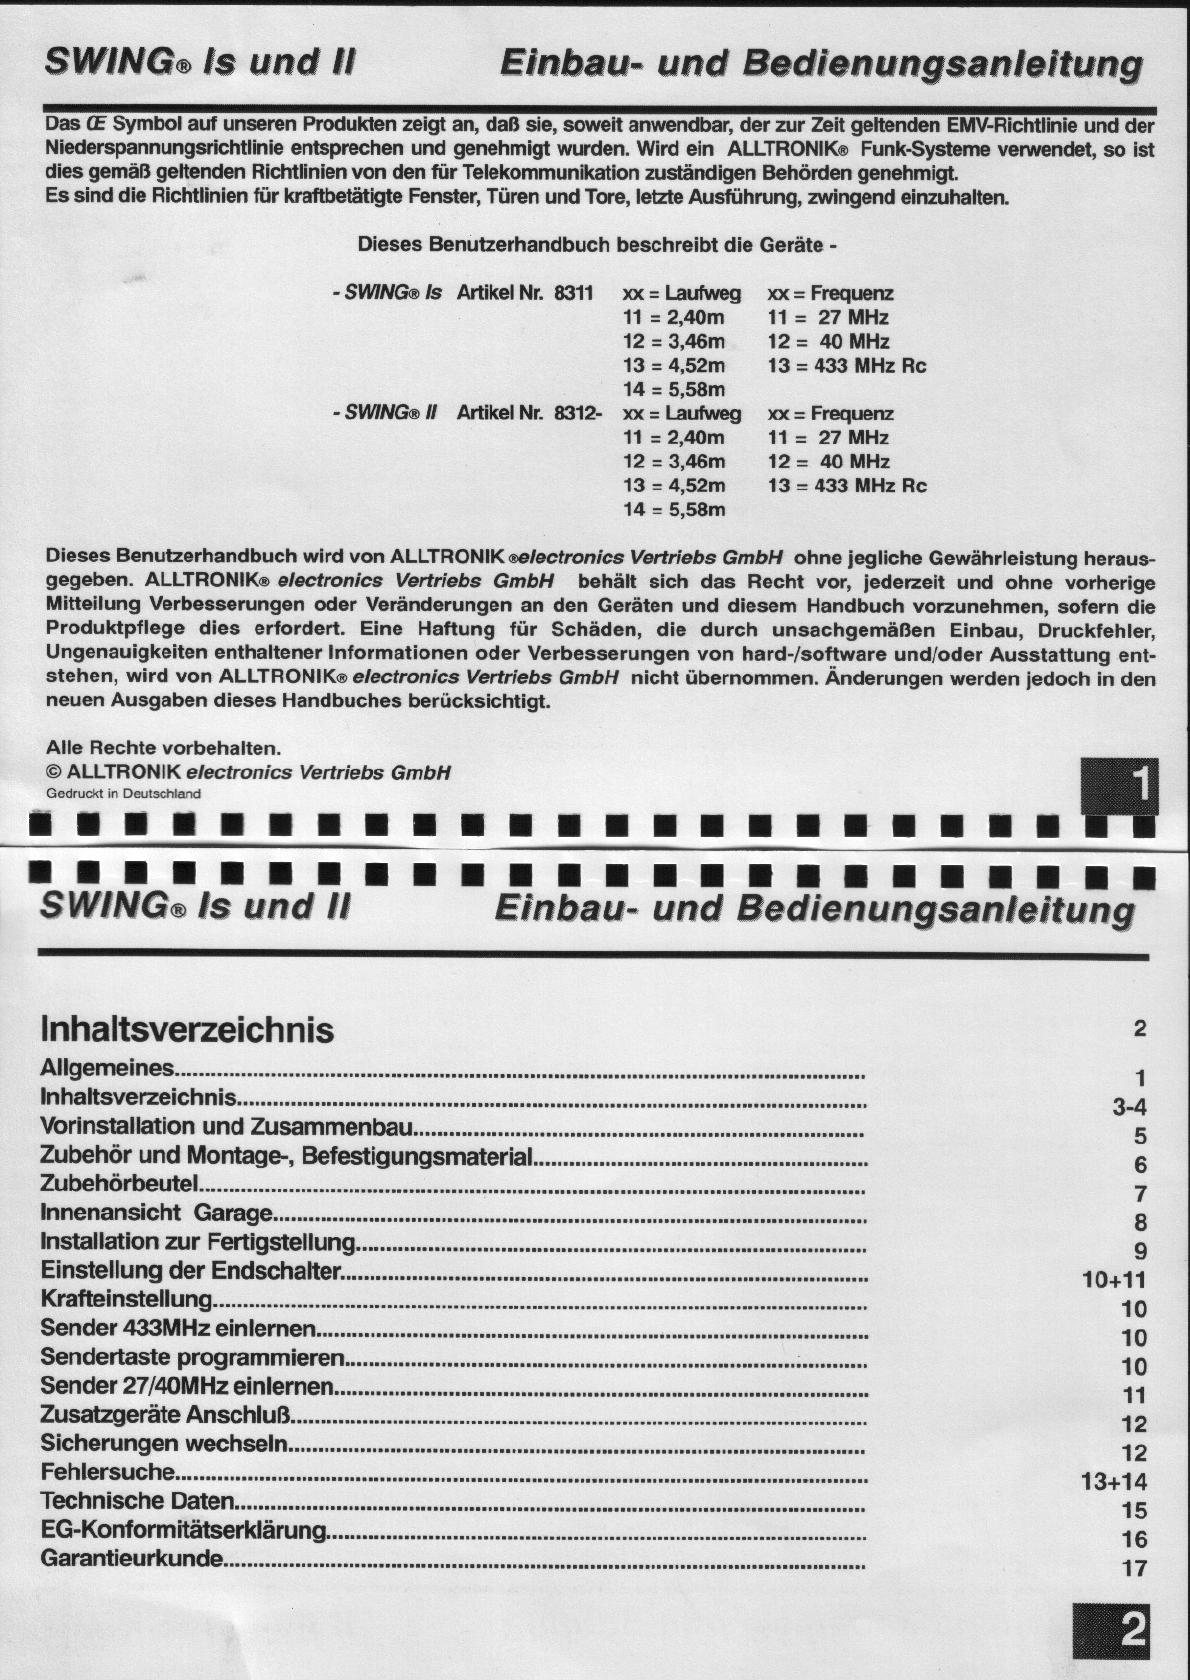 Manual Alltronik Speed 600S (page 2 of 9) (German)